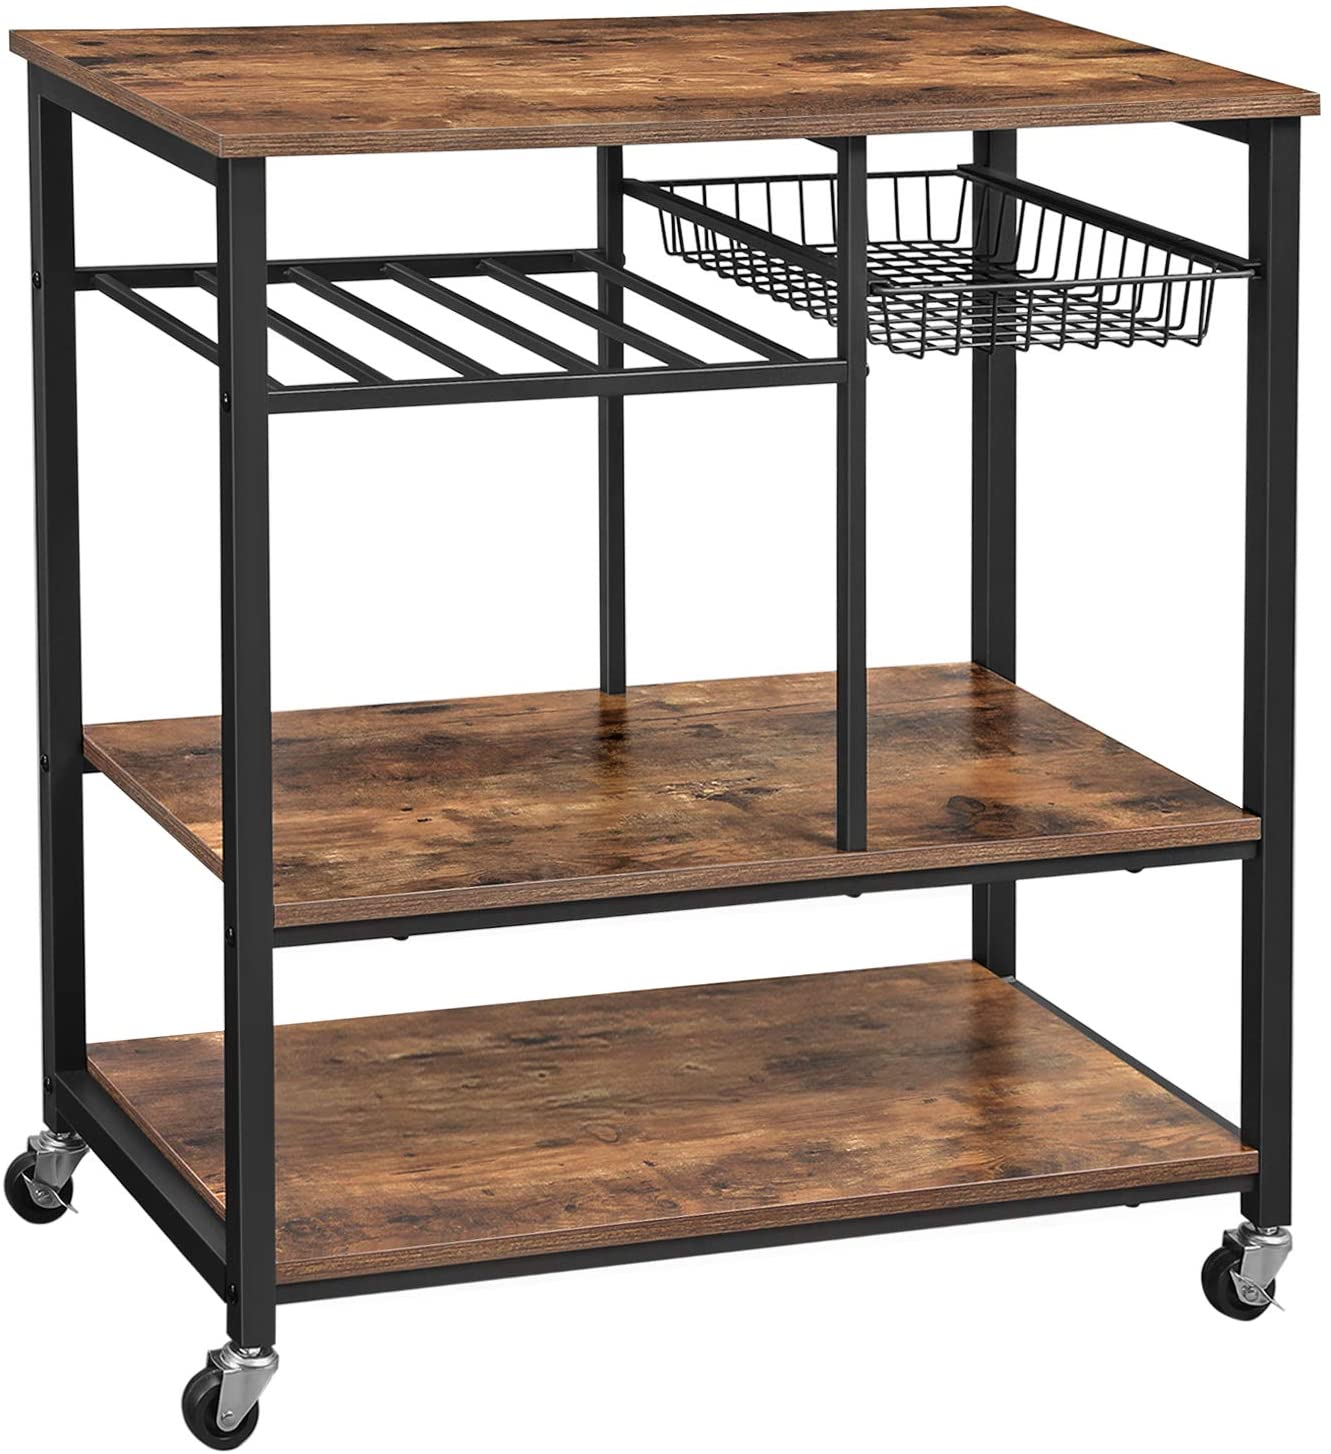 vasagle alinru kitchen cart kitchen baker s rack utility storage shelf with bottle holder industrial microwave stand rustic brown ukks80x